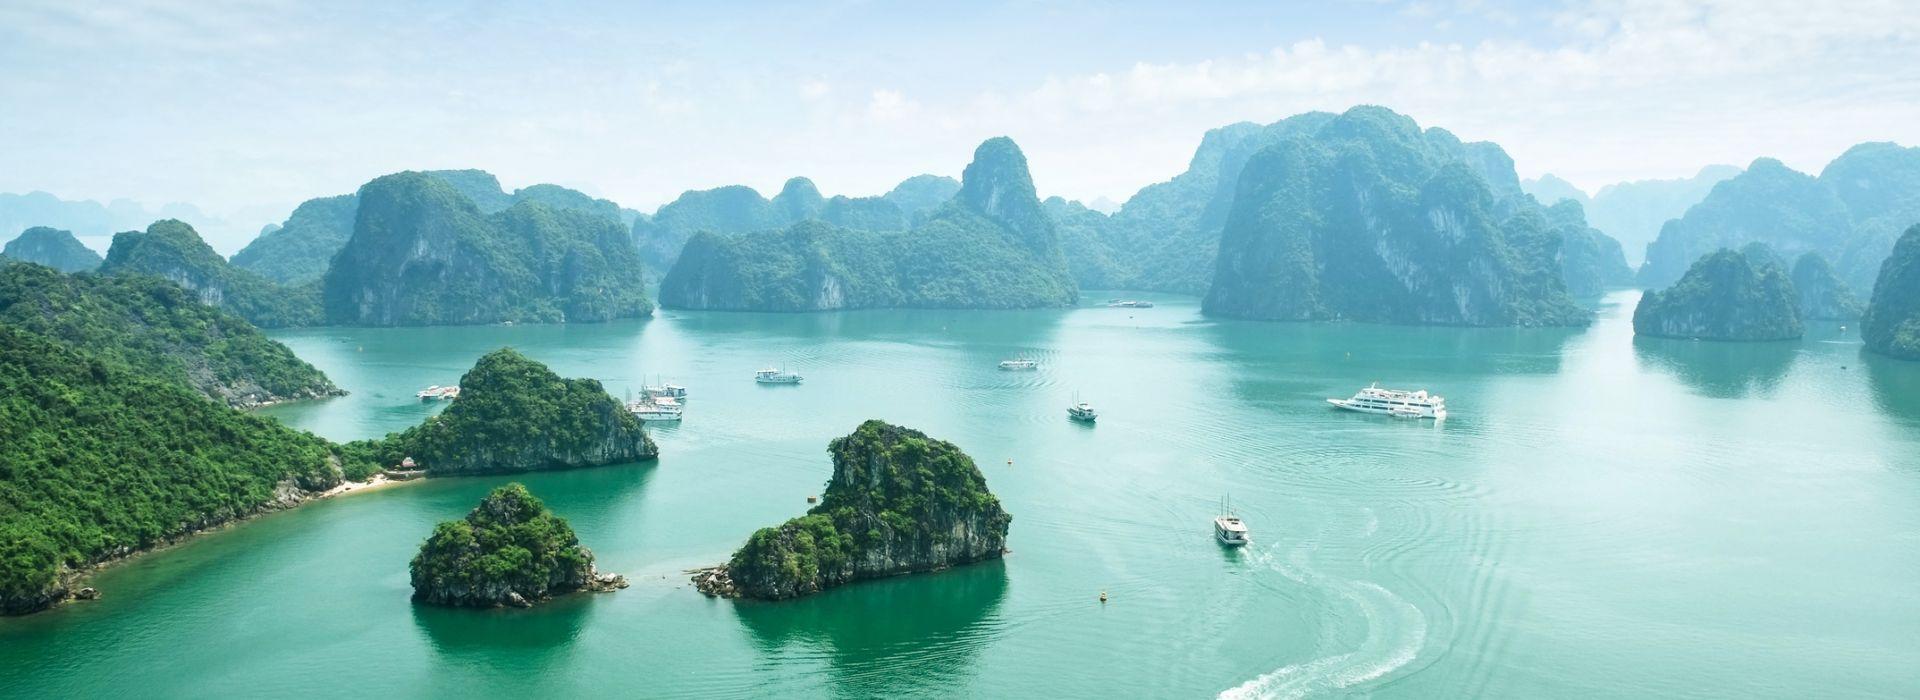 Local boat rides Tours in Da Nang